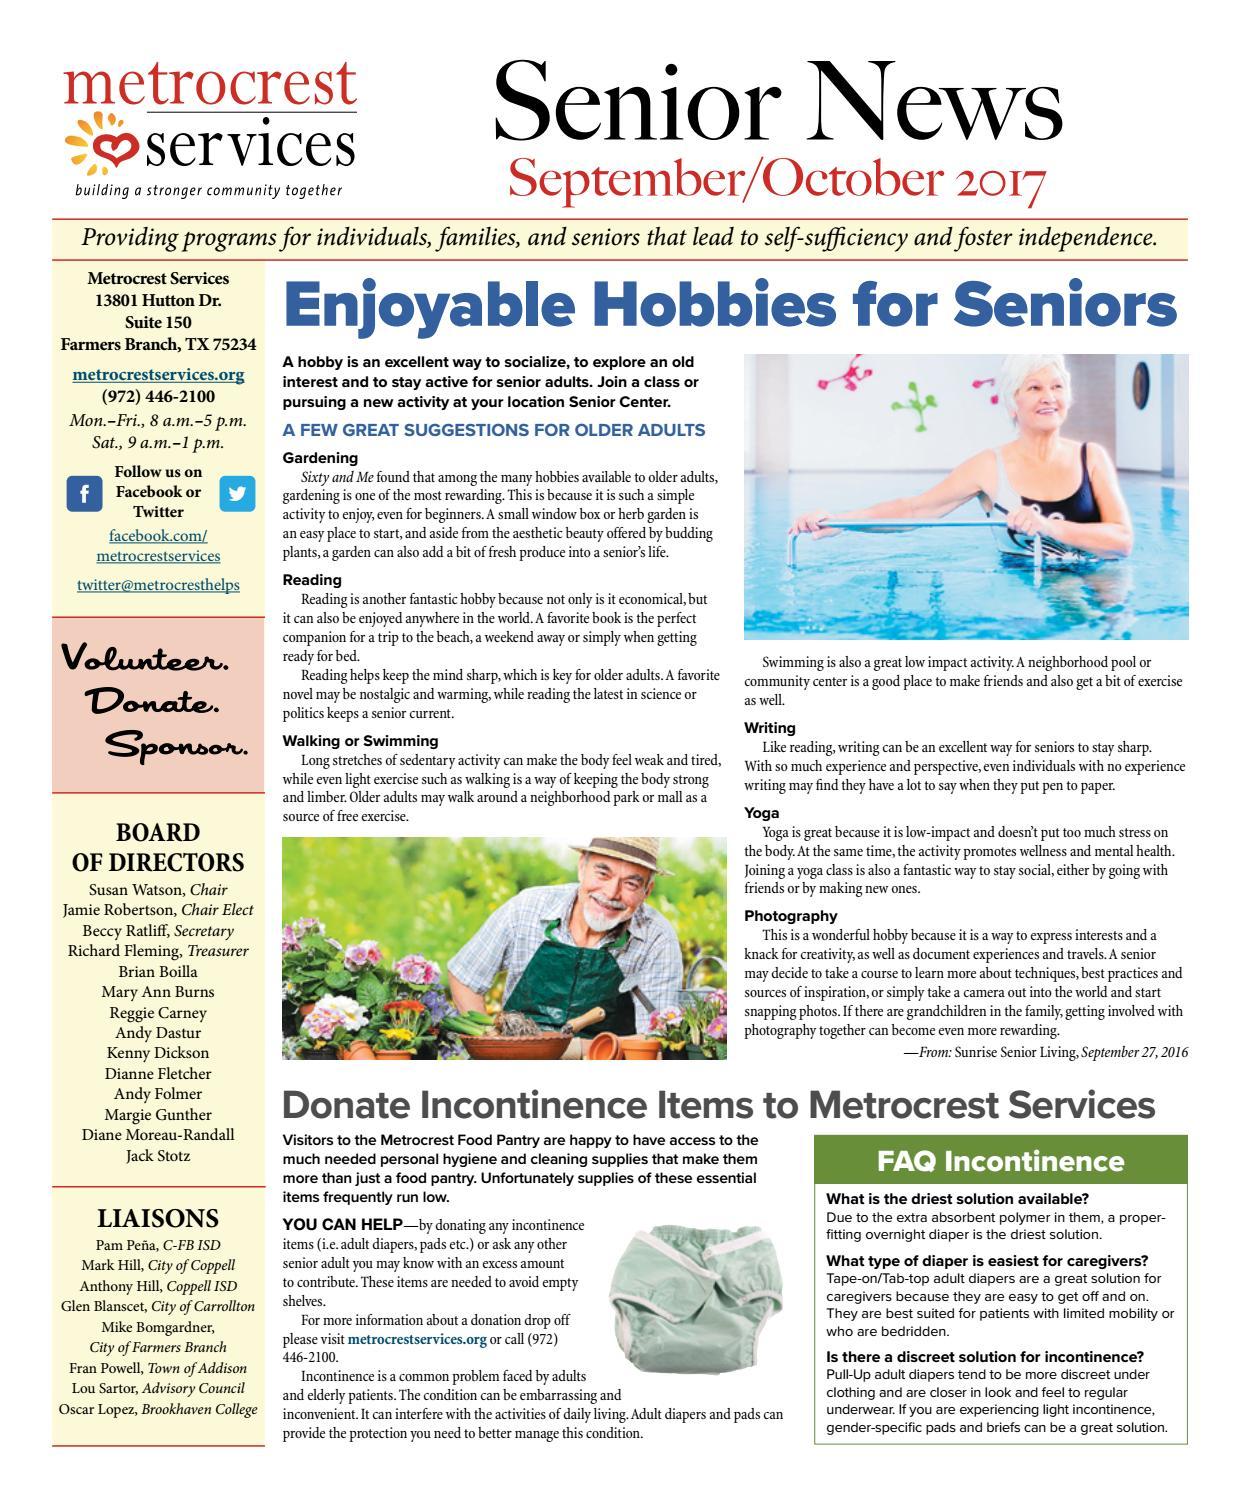 Metrocrest Services Senior News September/October Edition by